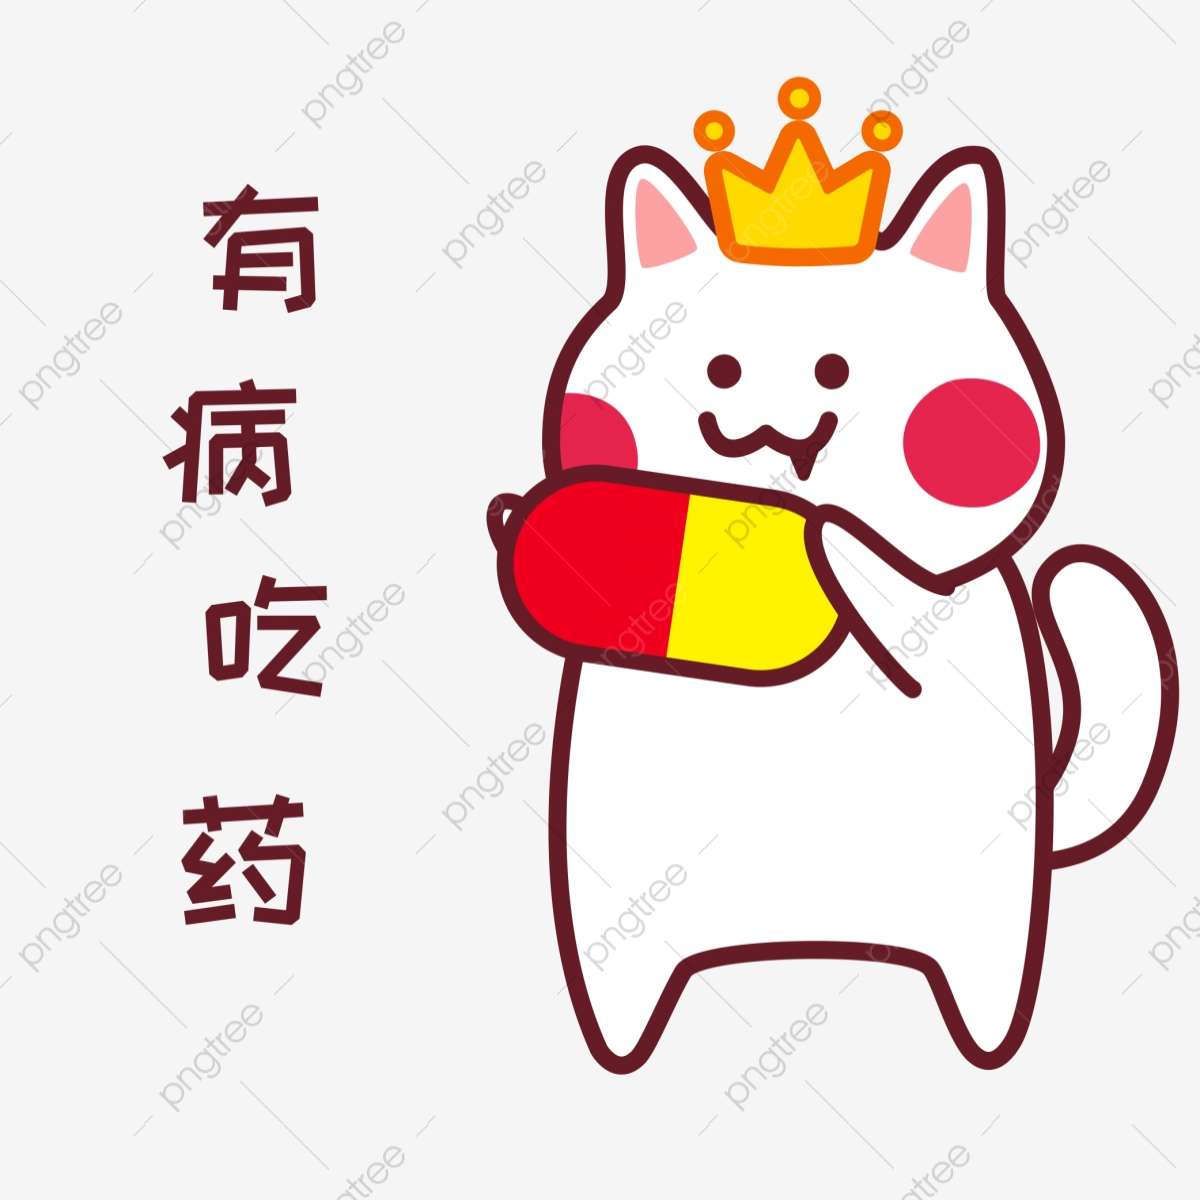 Haiwan Kartun Kucing Chick Cawan Dunia Cawan Dunia Merah